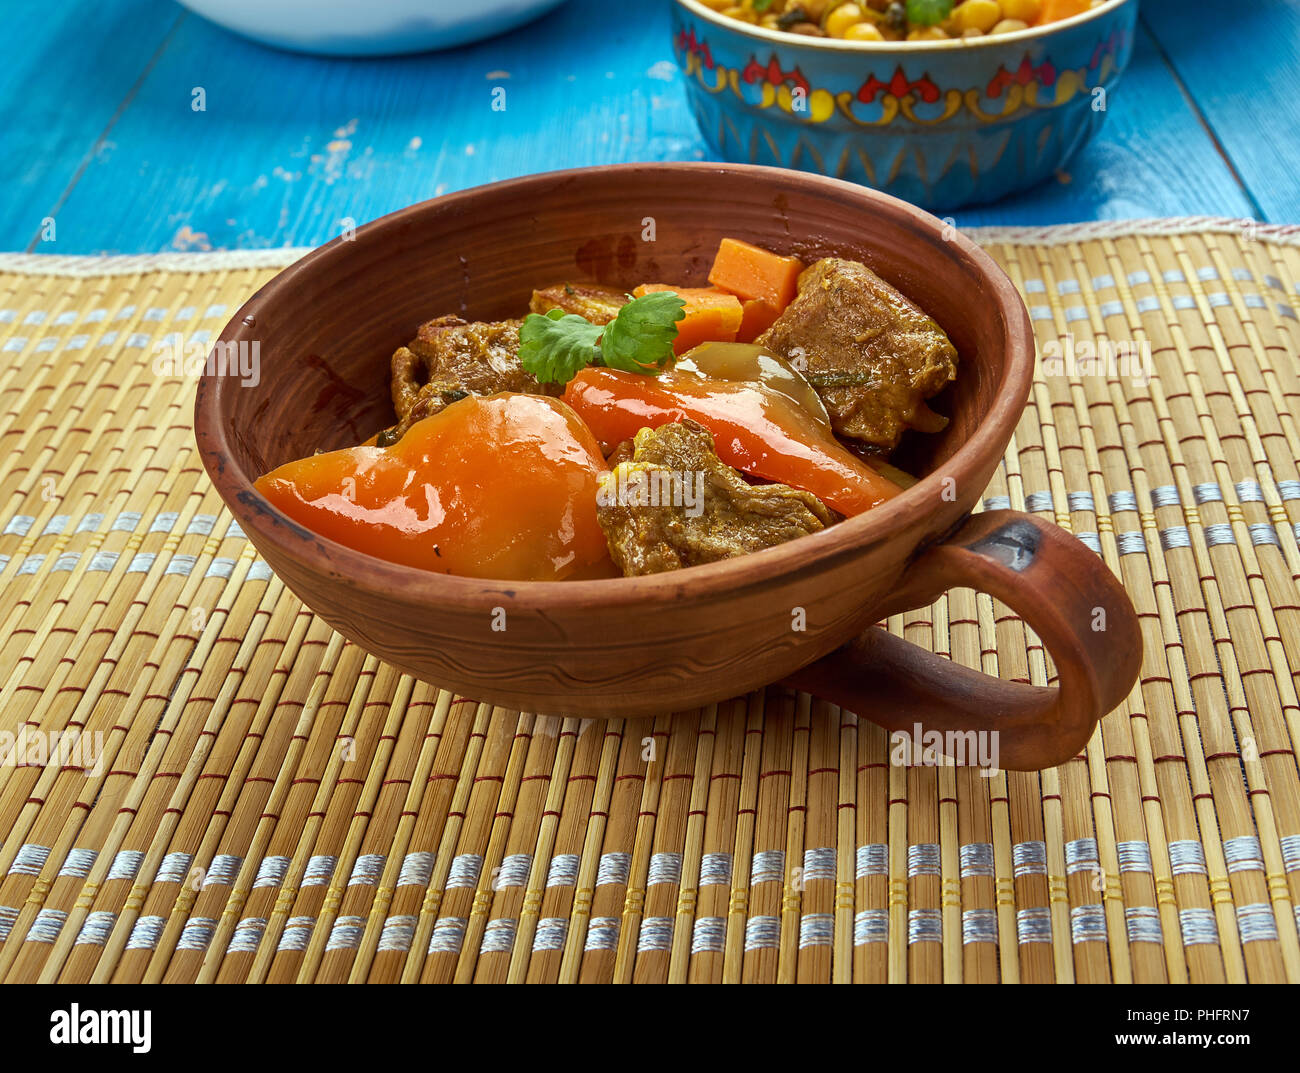 Azerbaijani dish Tava - Stock Image